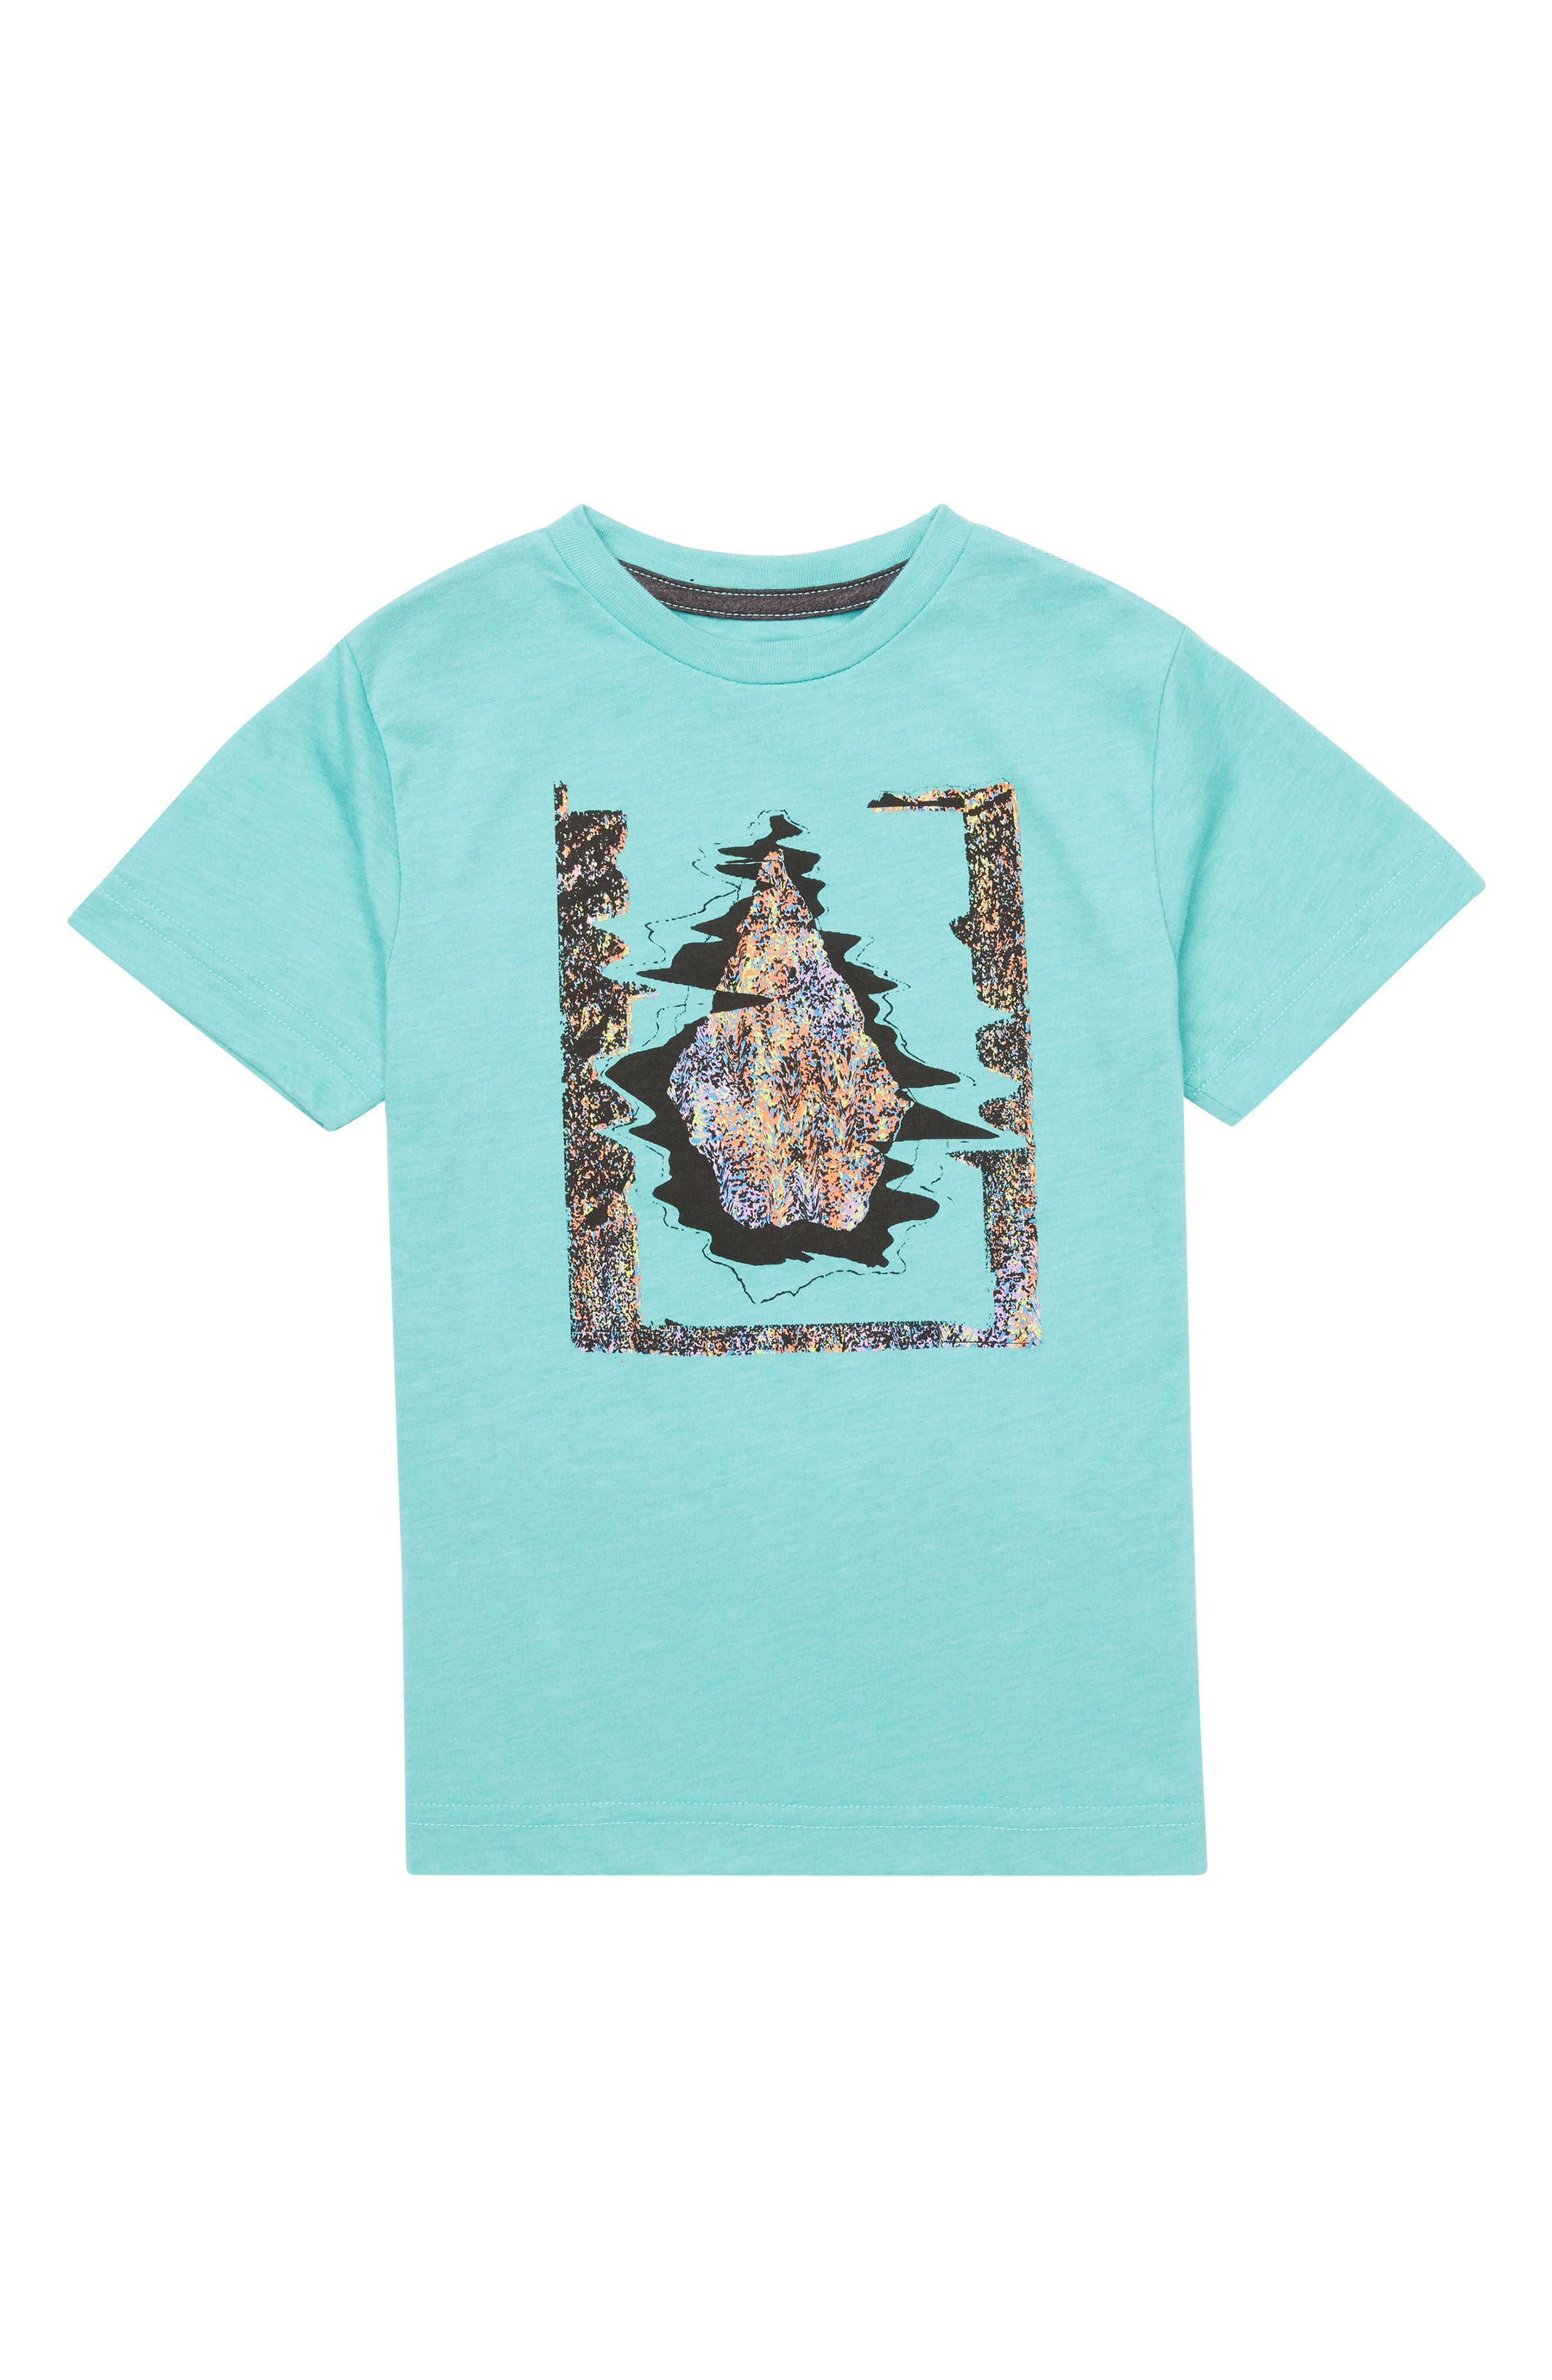 Statiq Graphic T-Shirt,                         Main,                         color, Turquoise